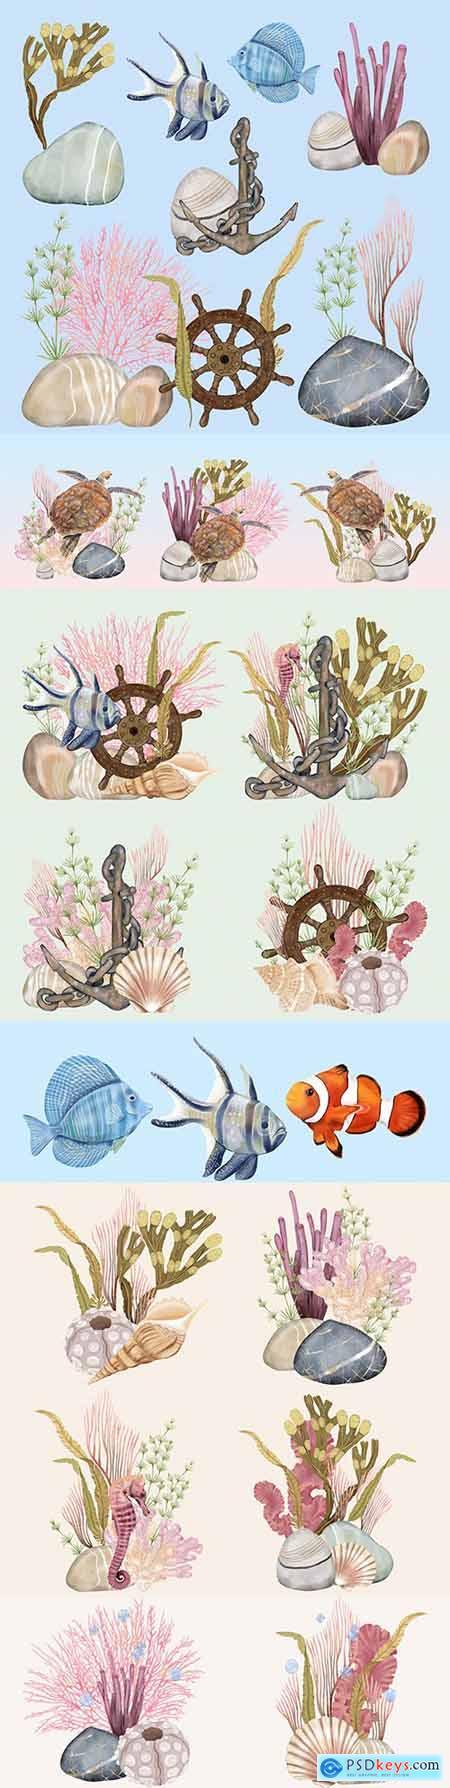 Underwater world and marine multicolored fish with algae